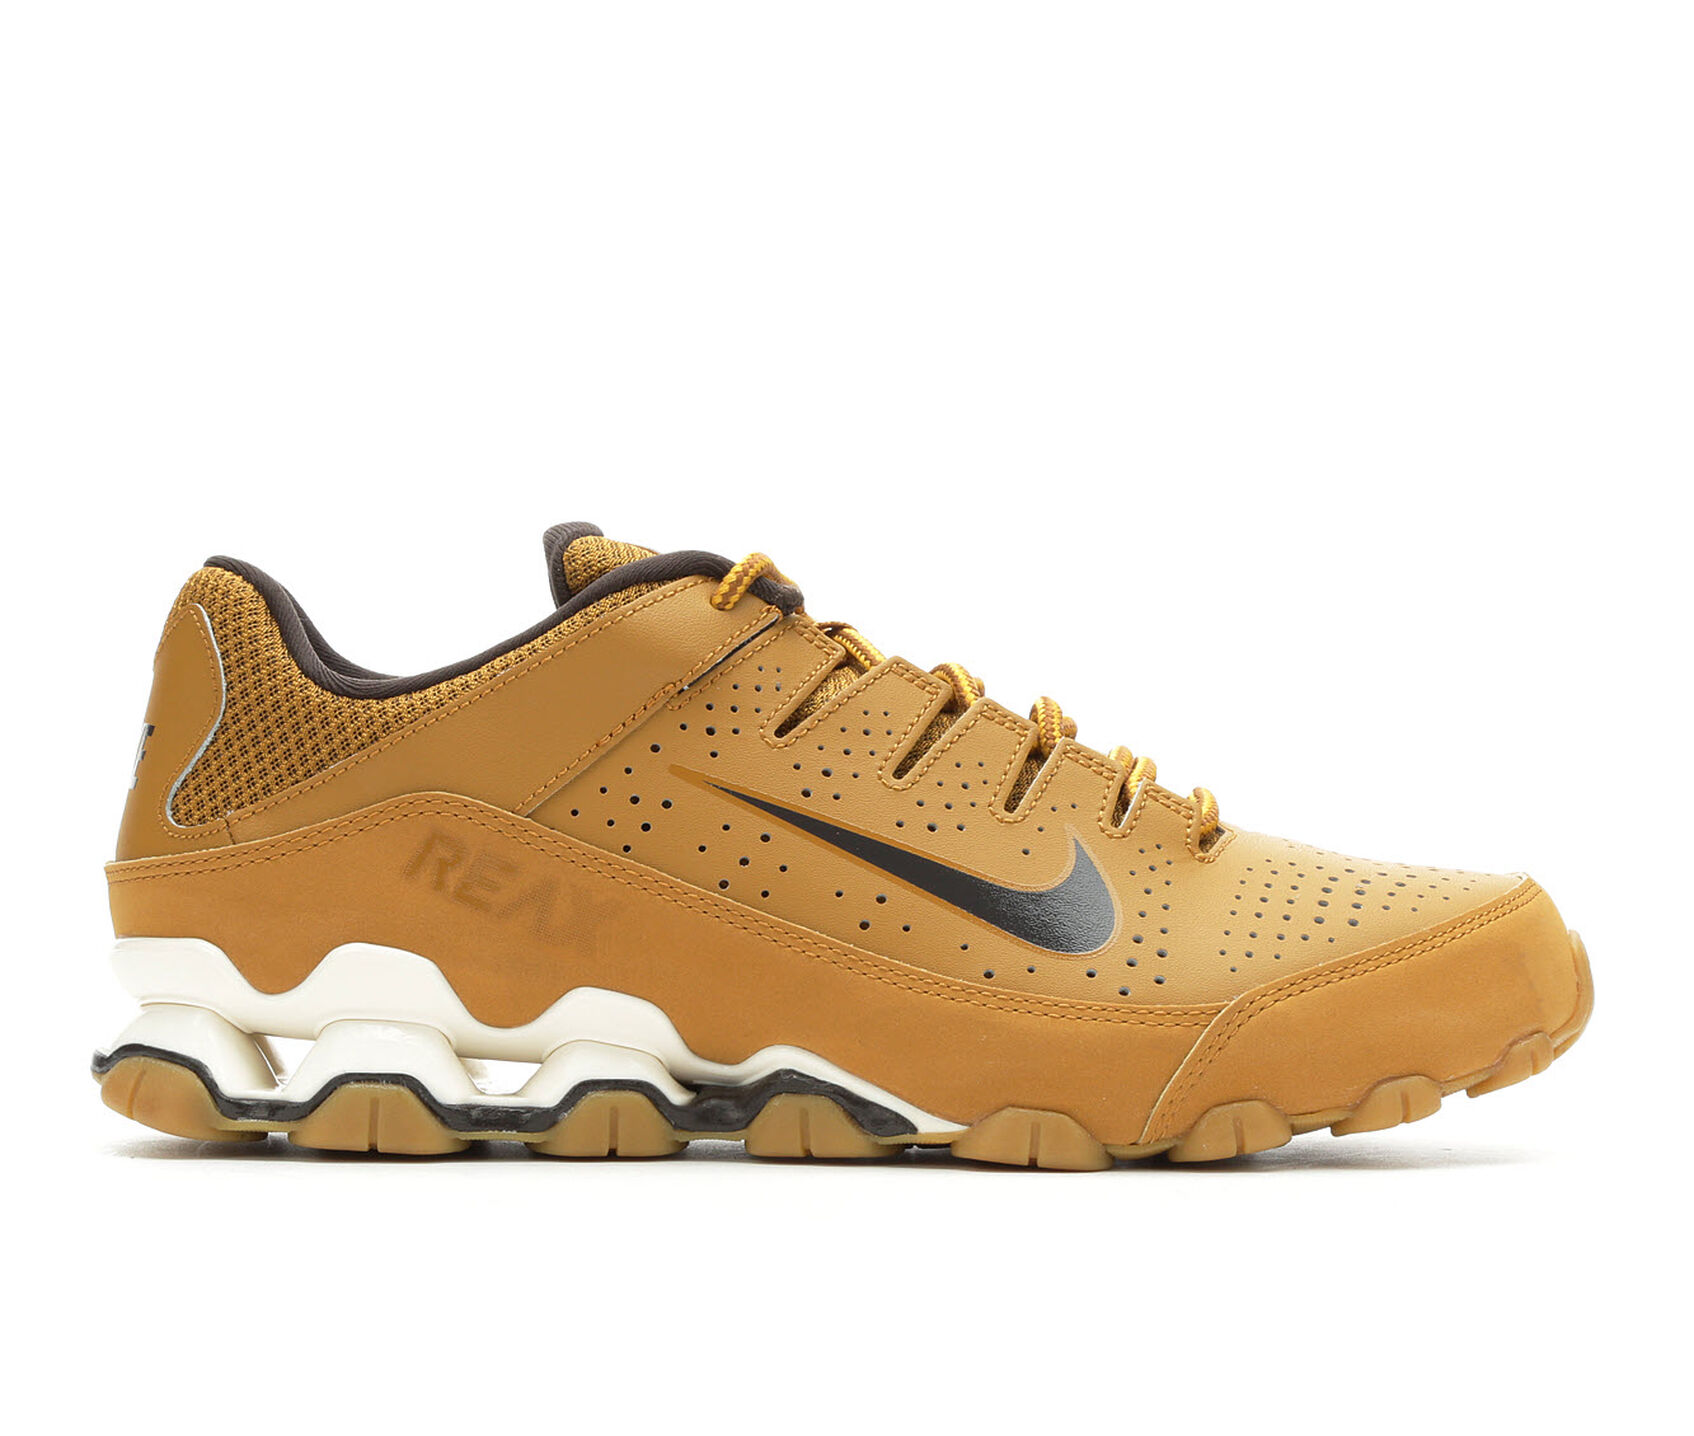 f481cff2f485c1 ... Nike Reax 8 TR Training Shoes. Previous